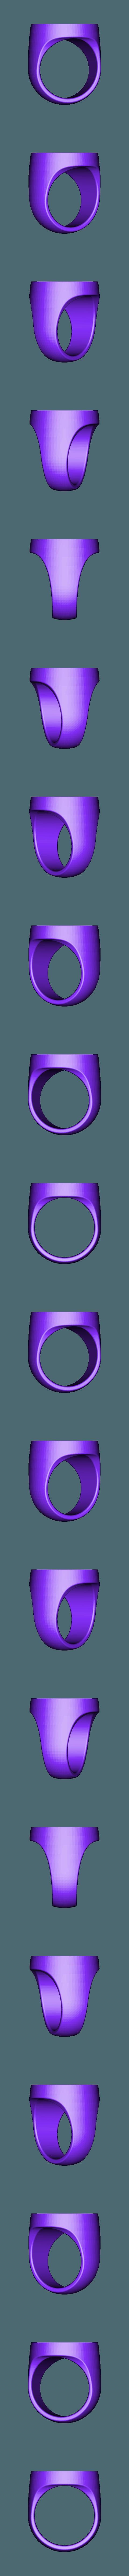 Orange_Lantern_Ring_pt1.STL Download free STL file Orange Lantern Ring for Dual Extrusion • 3D printing model, niceandeasy